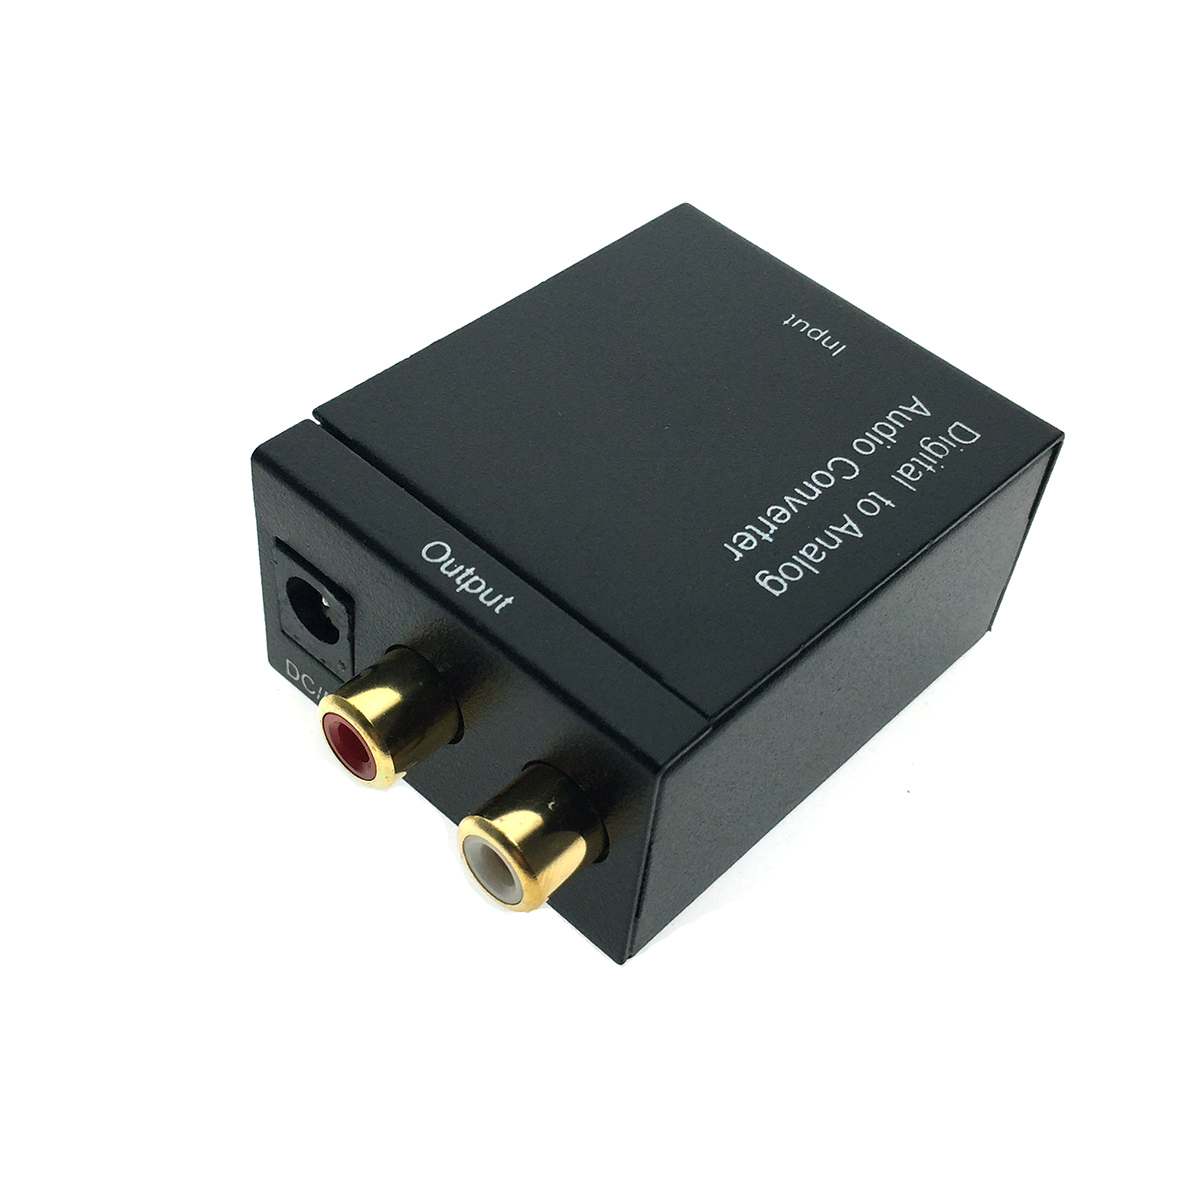 Аудио конвертер 1xToslink + 1RCA(Coaxil) to 2x RCA (analog), модель EDH-TR/R, Espada